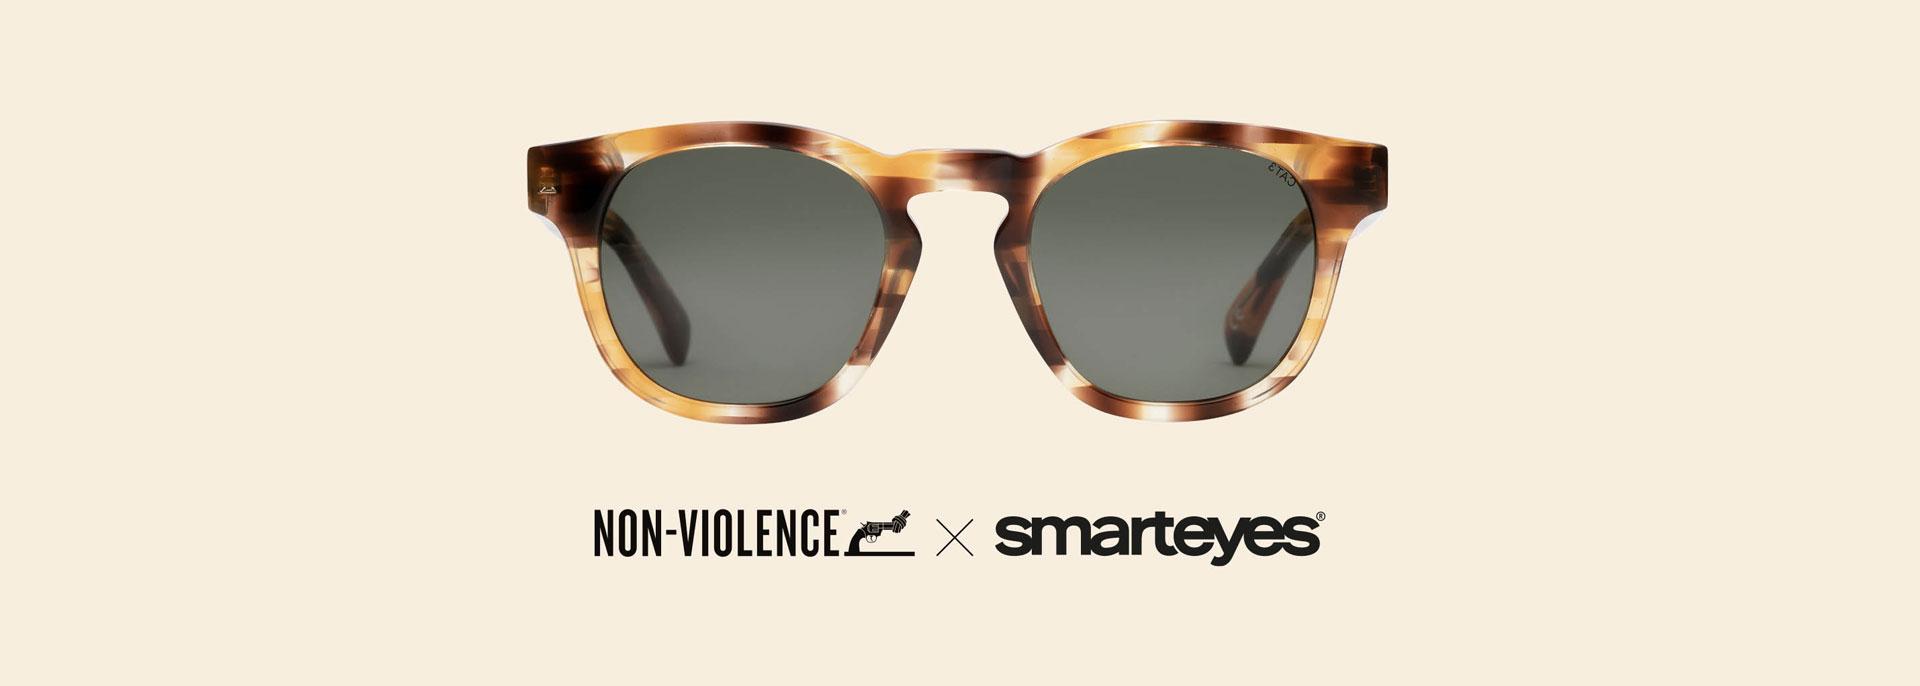 Ny solbrillekollektion Non-Violence Sun Collection I Smarteyes